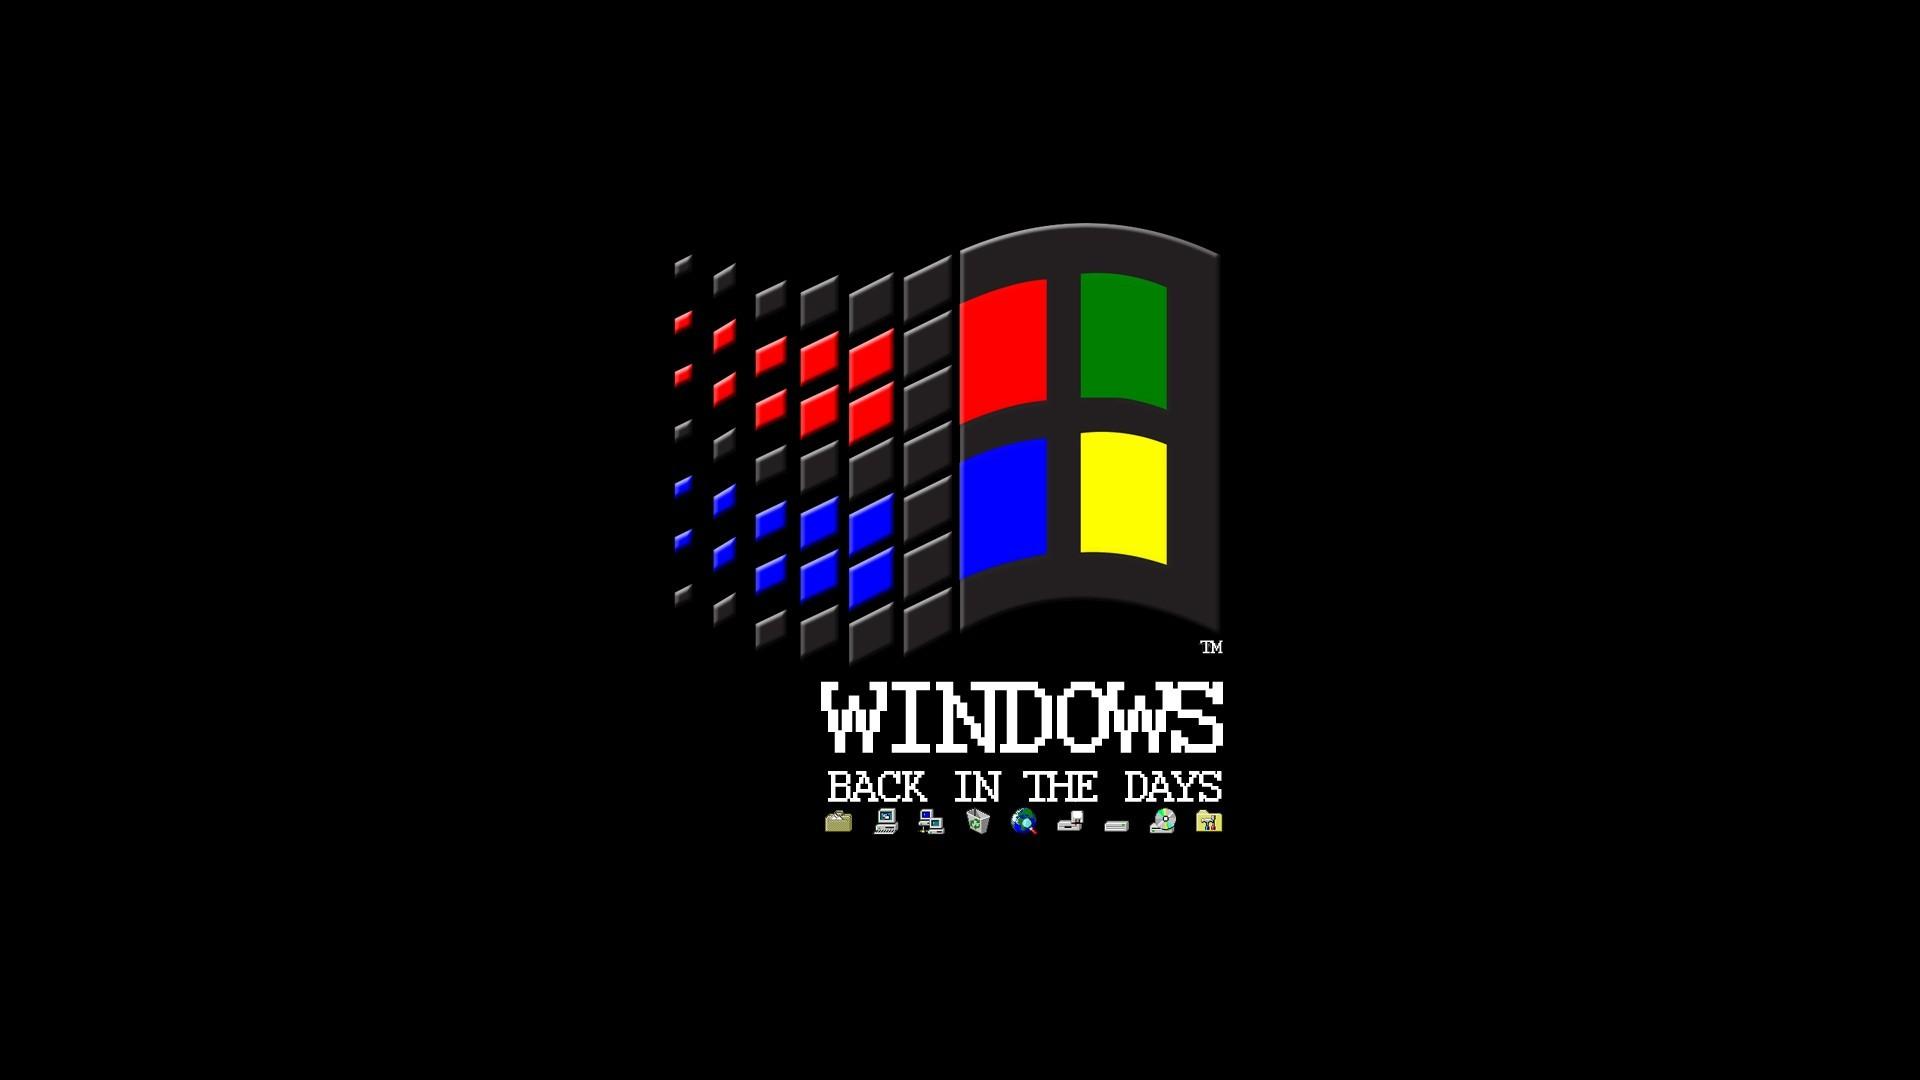 General 1920x1080 Microsoft Windows logo black background floppy disk MS-DOS internet